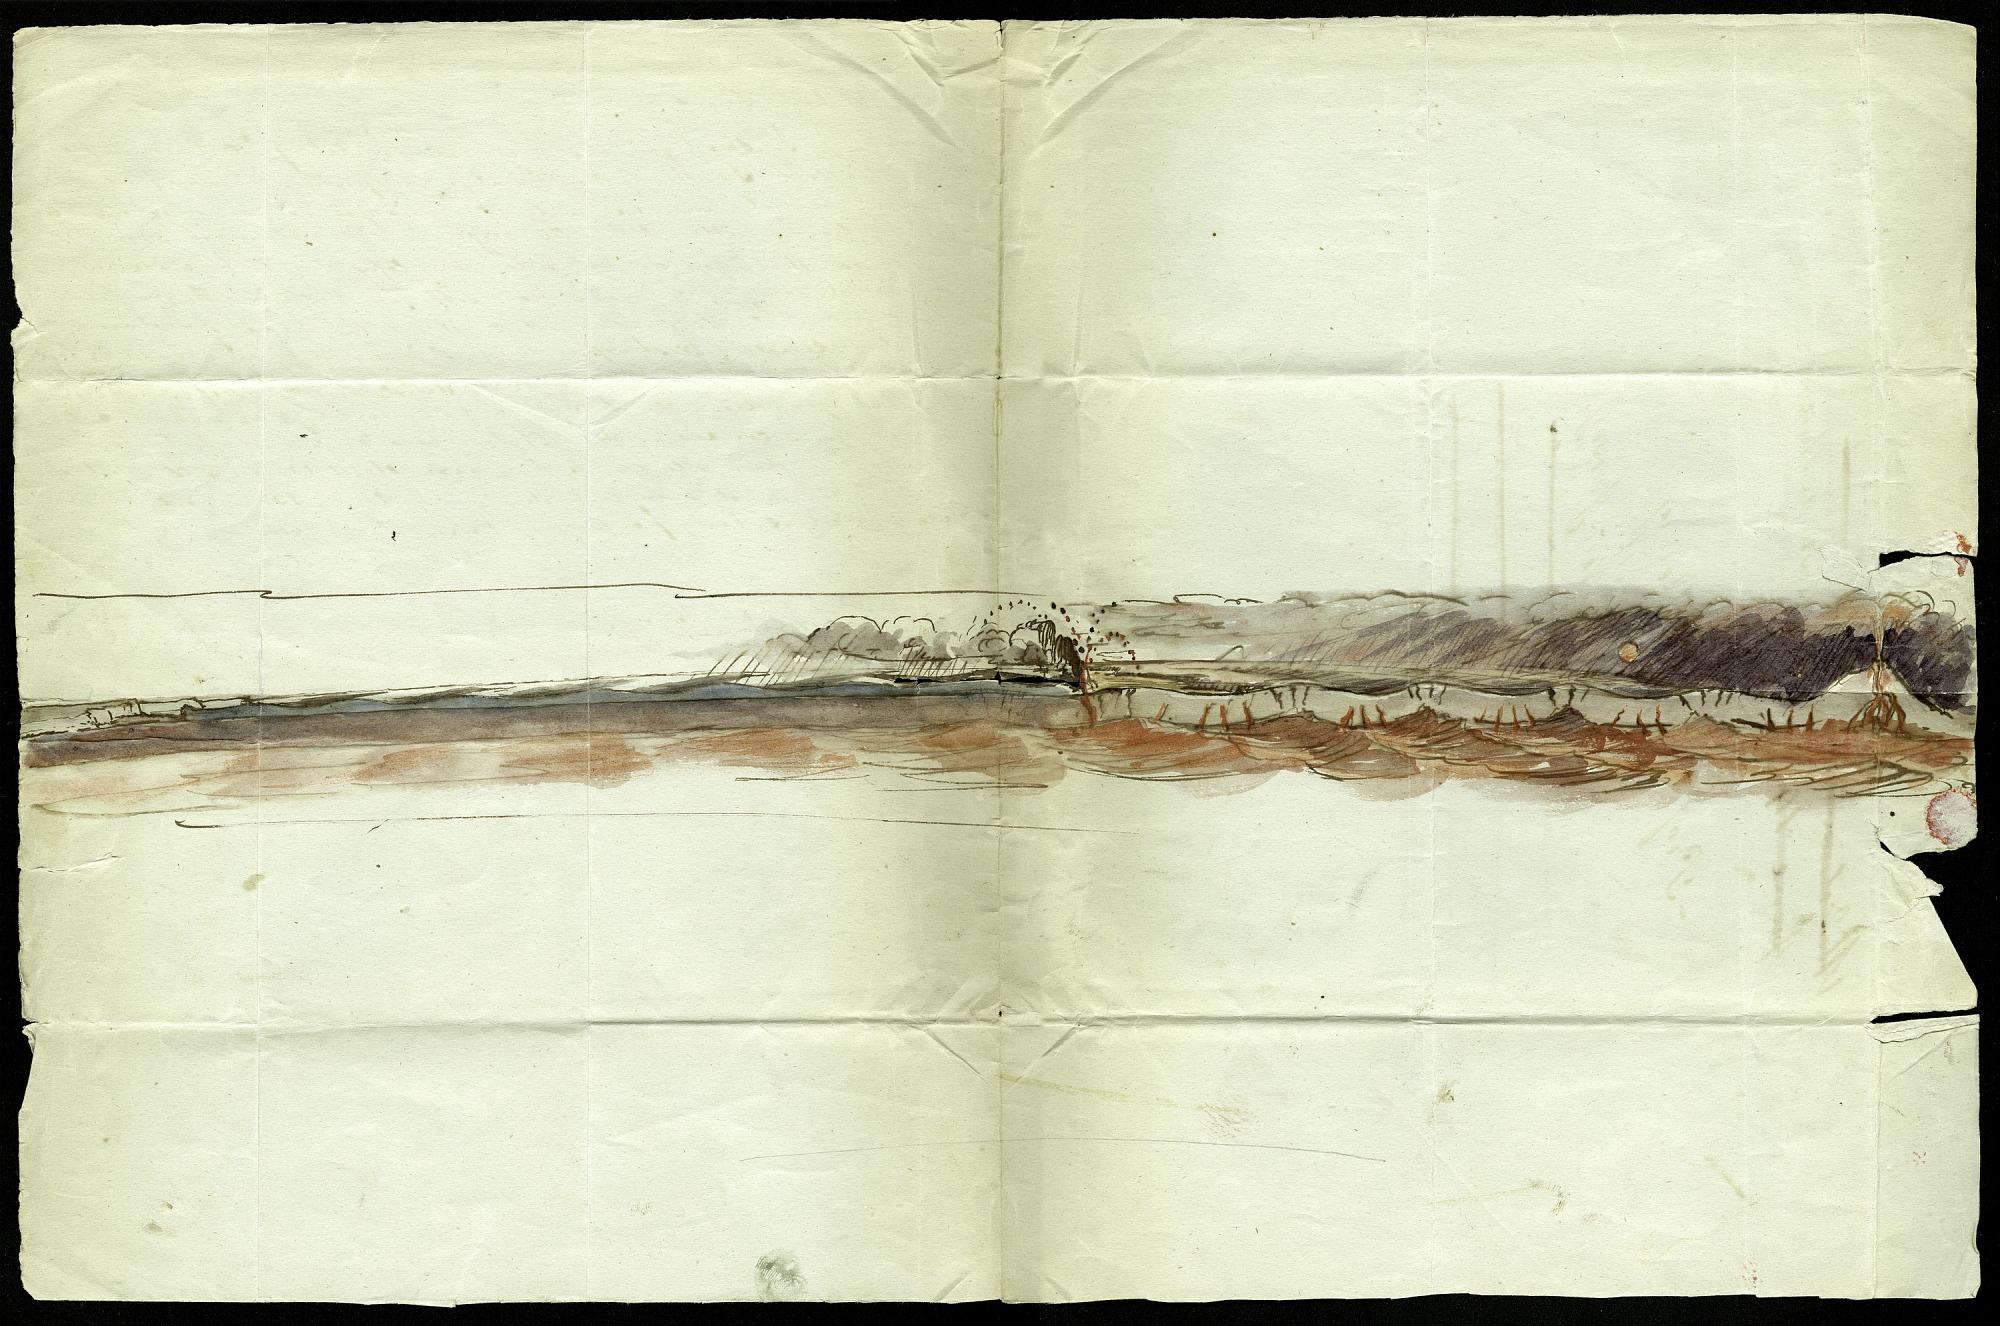 Chalk Drawing of an Earthquake